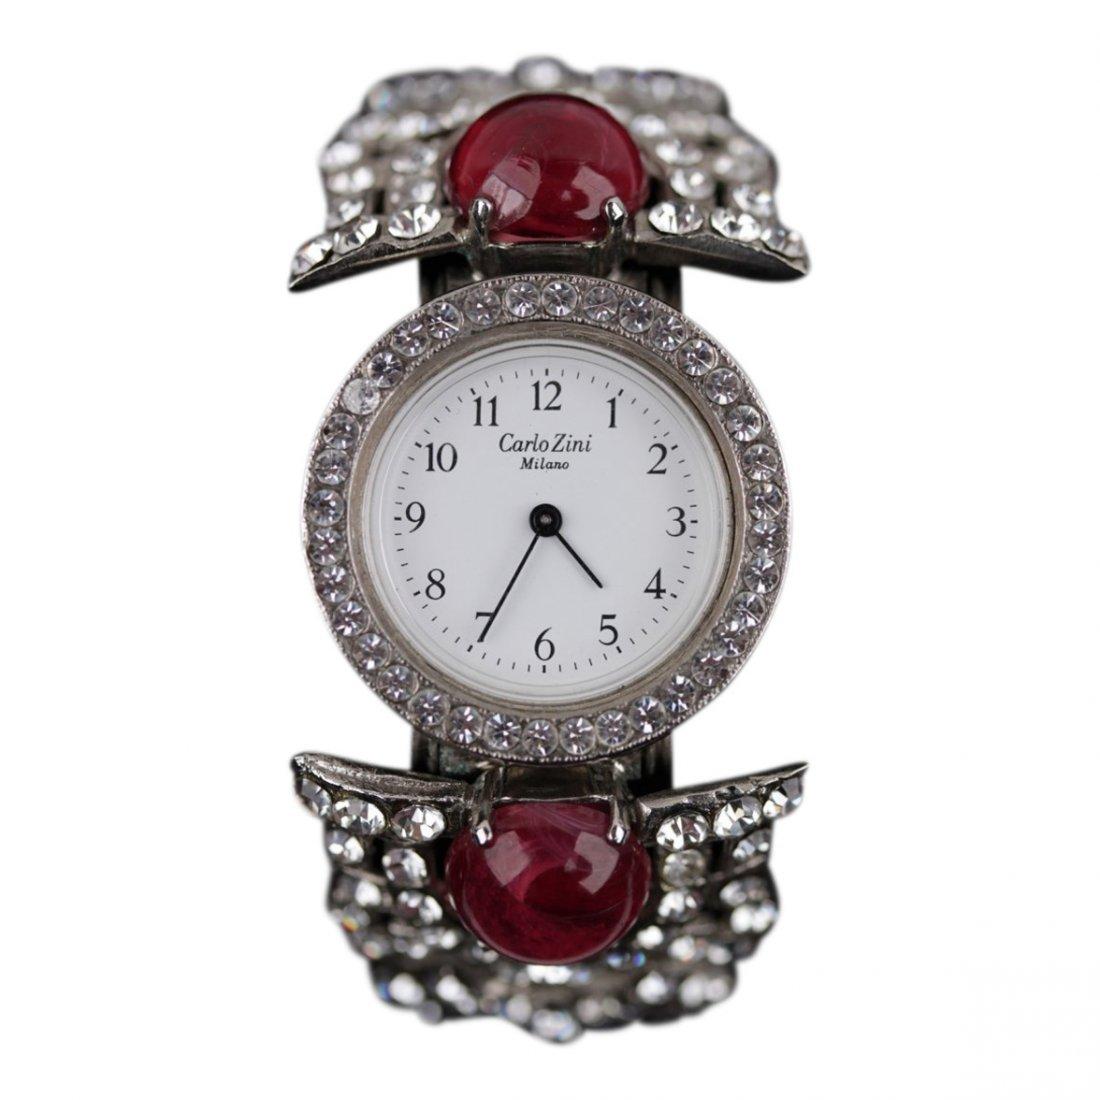 Vintage Carlo Zini Crystal Rhinestones Wristwatch